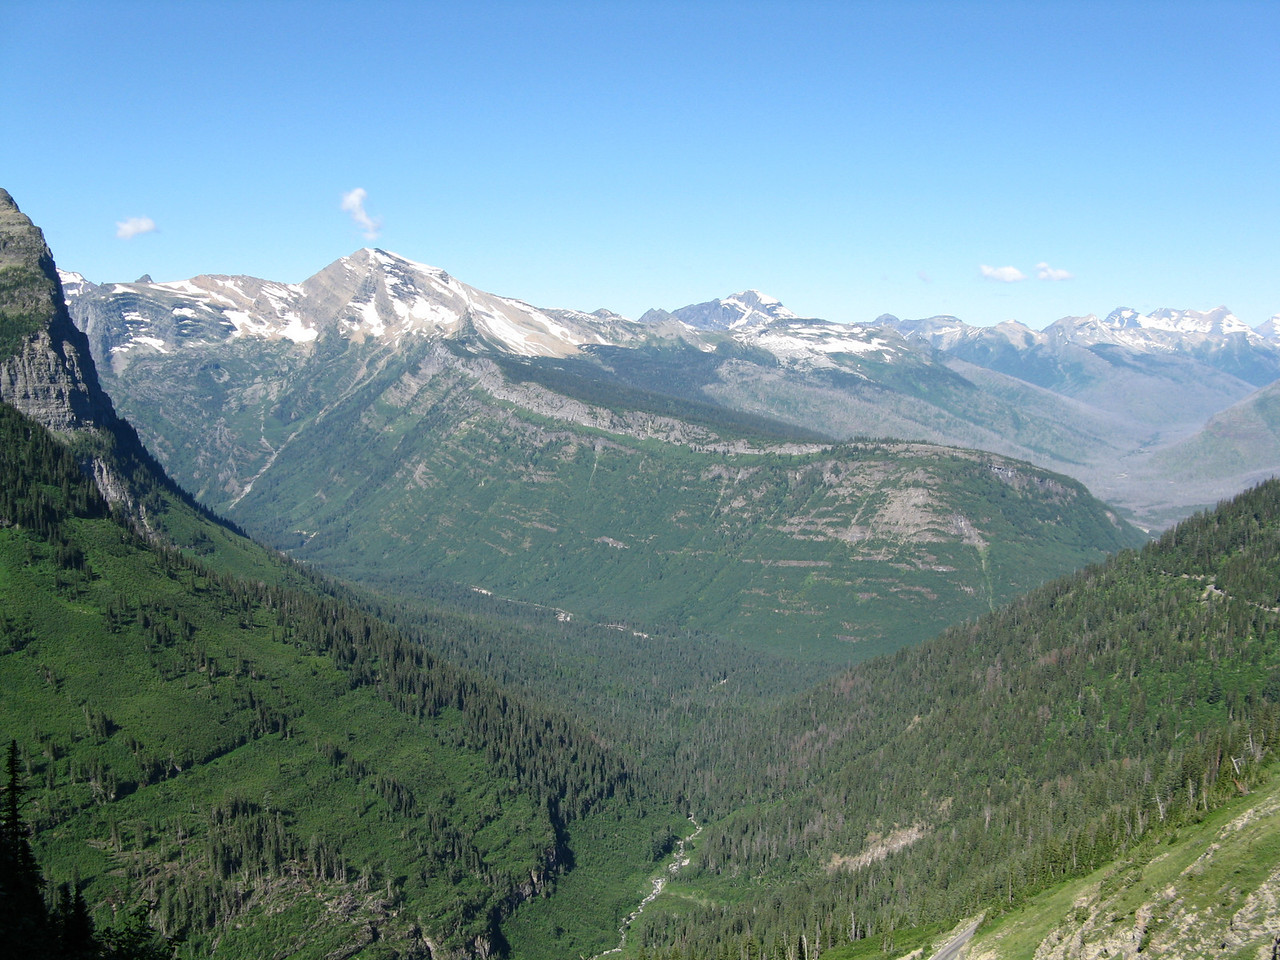 Heavens Peak across the valley.